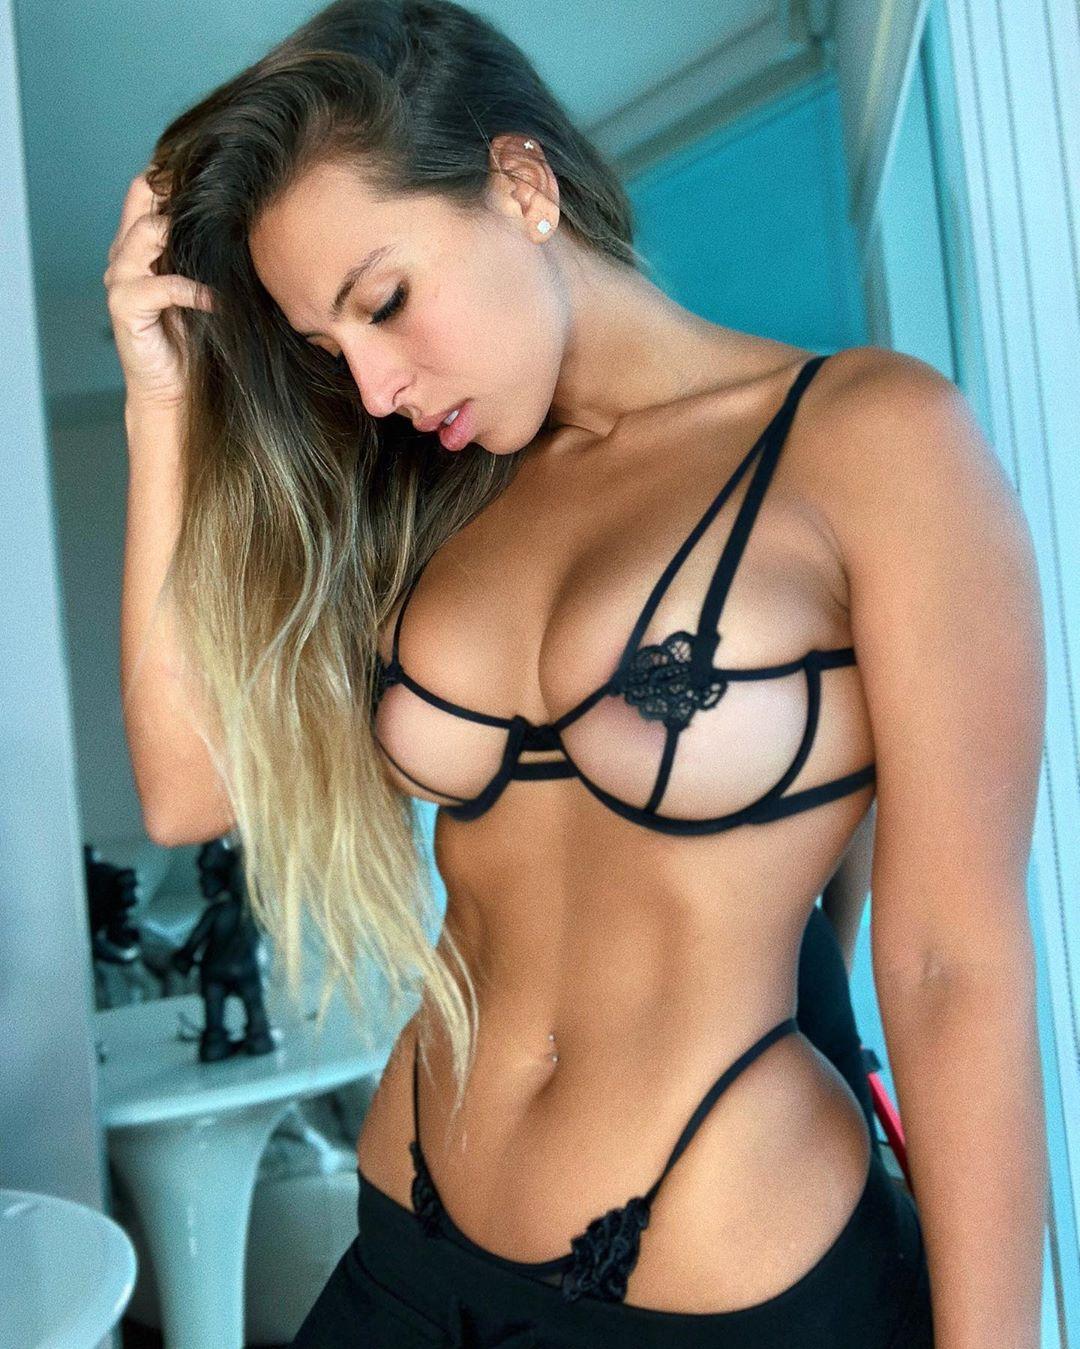 Natalia Garibotto Nude Onlyfans Leaked 0008